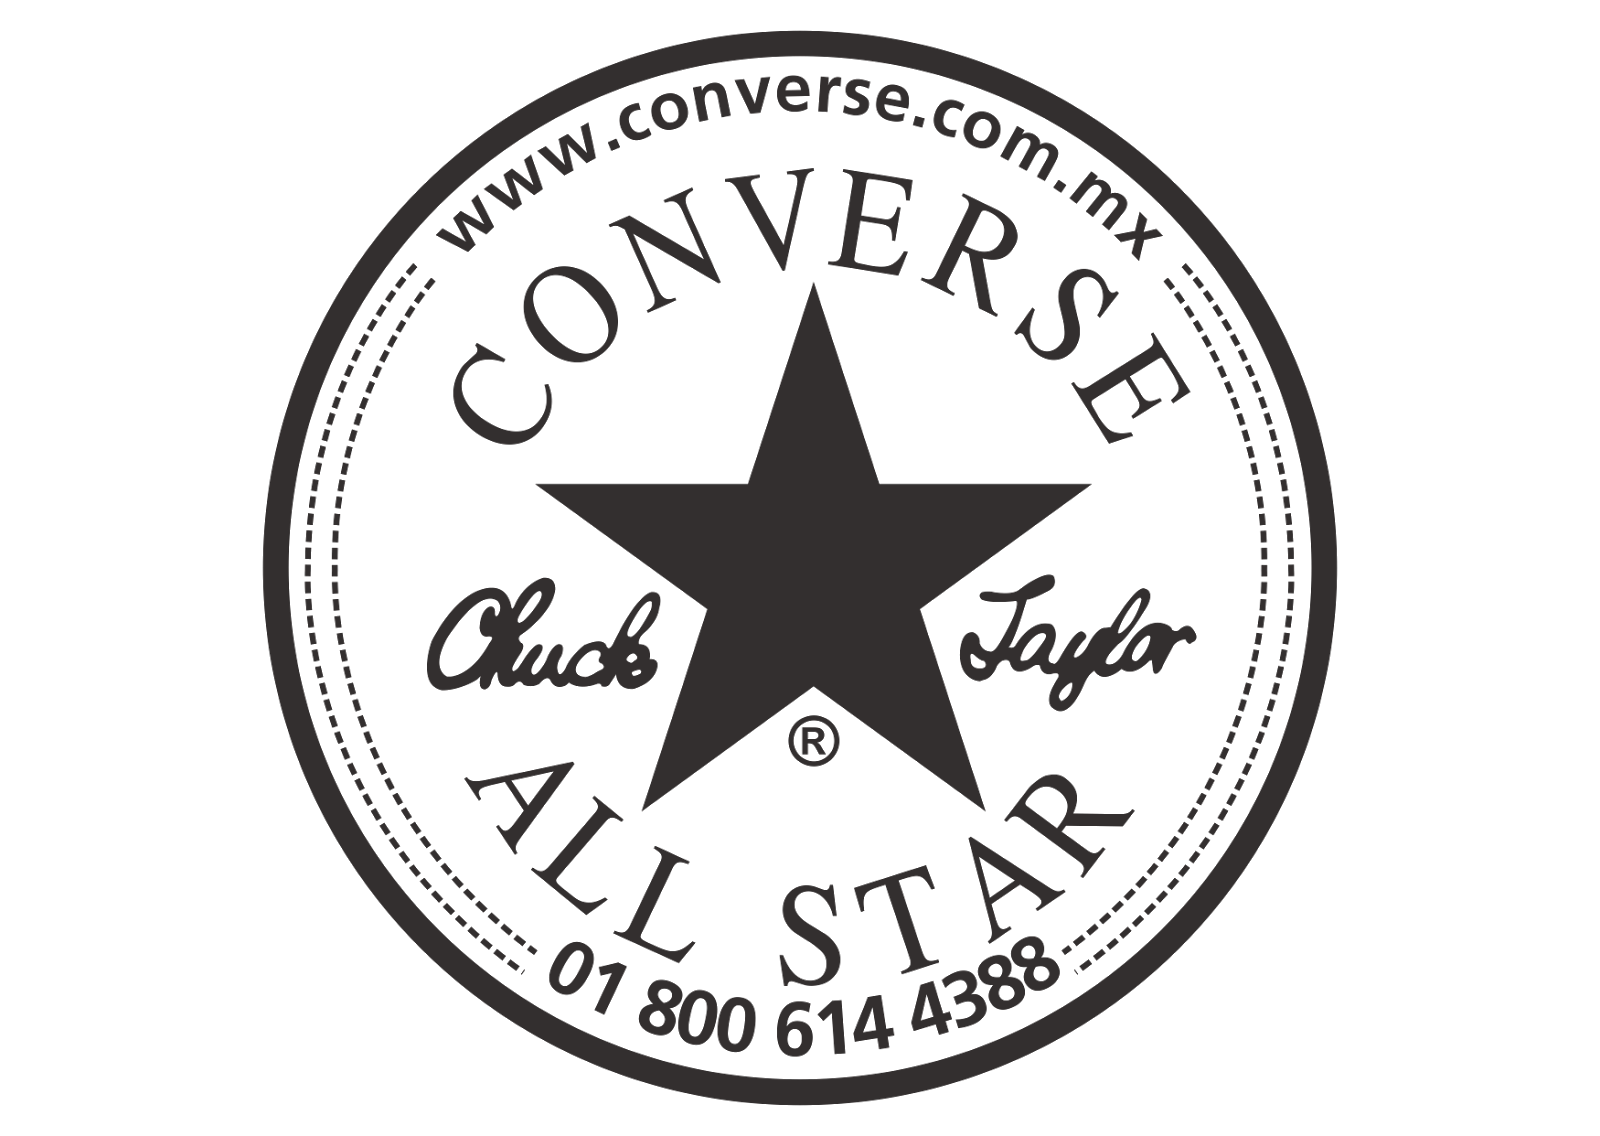 Converse All Star Logo Vector (Black-White) ~ Format Cdr